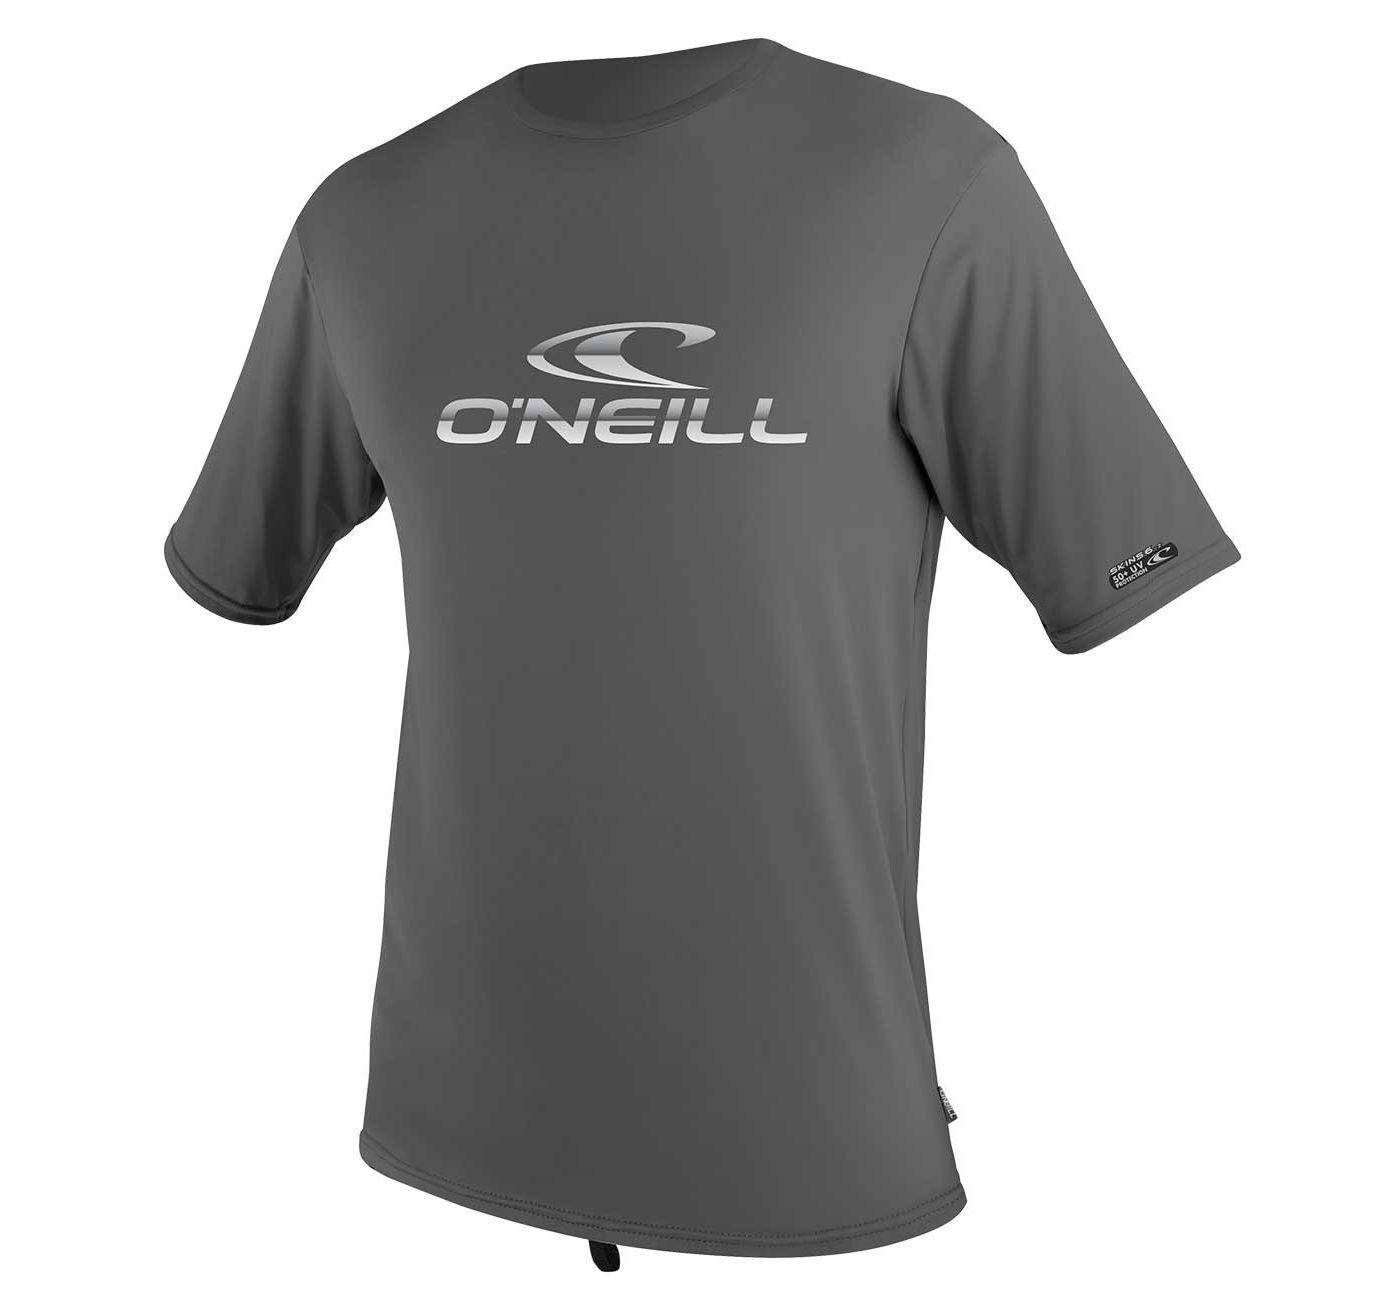 O'Neill Men's Core 2 Short Sleeve Rash Guard